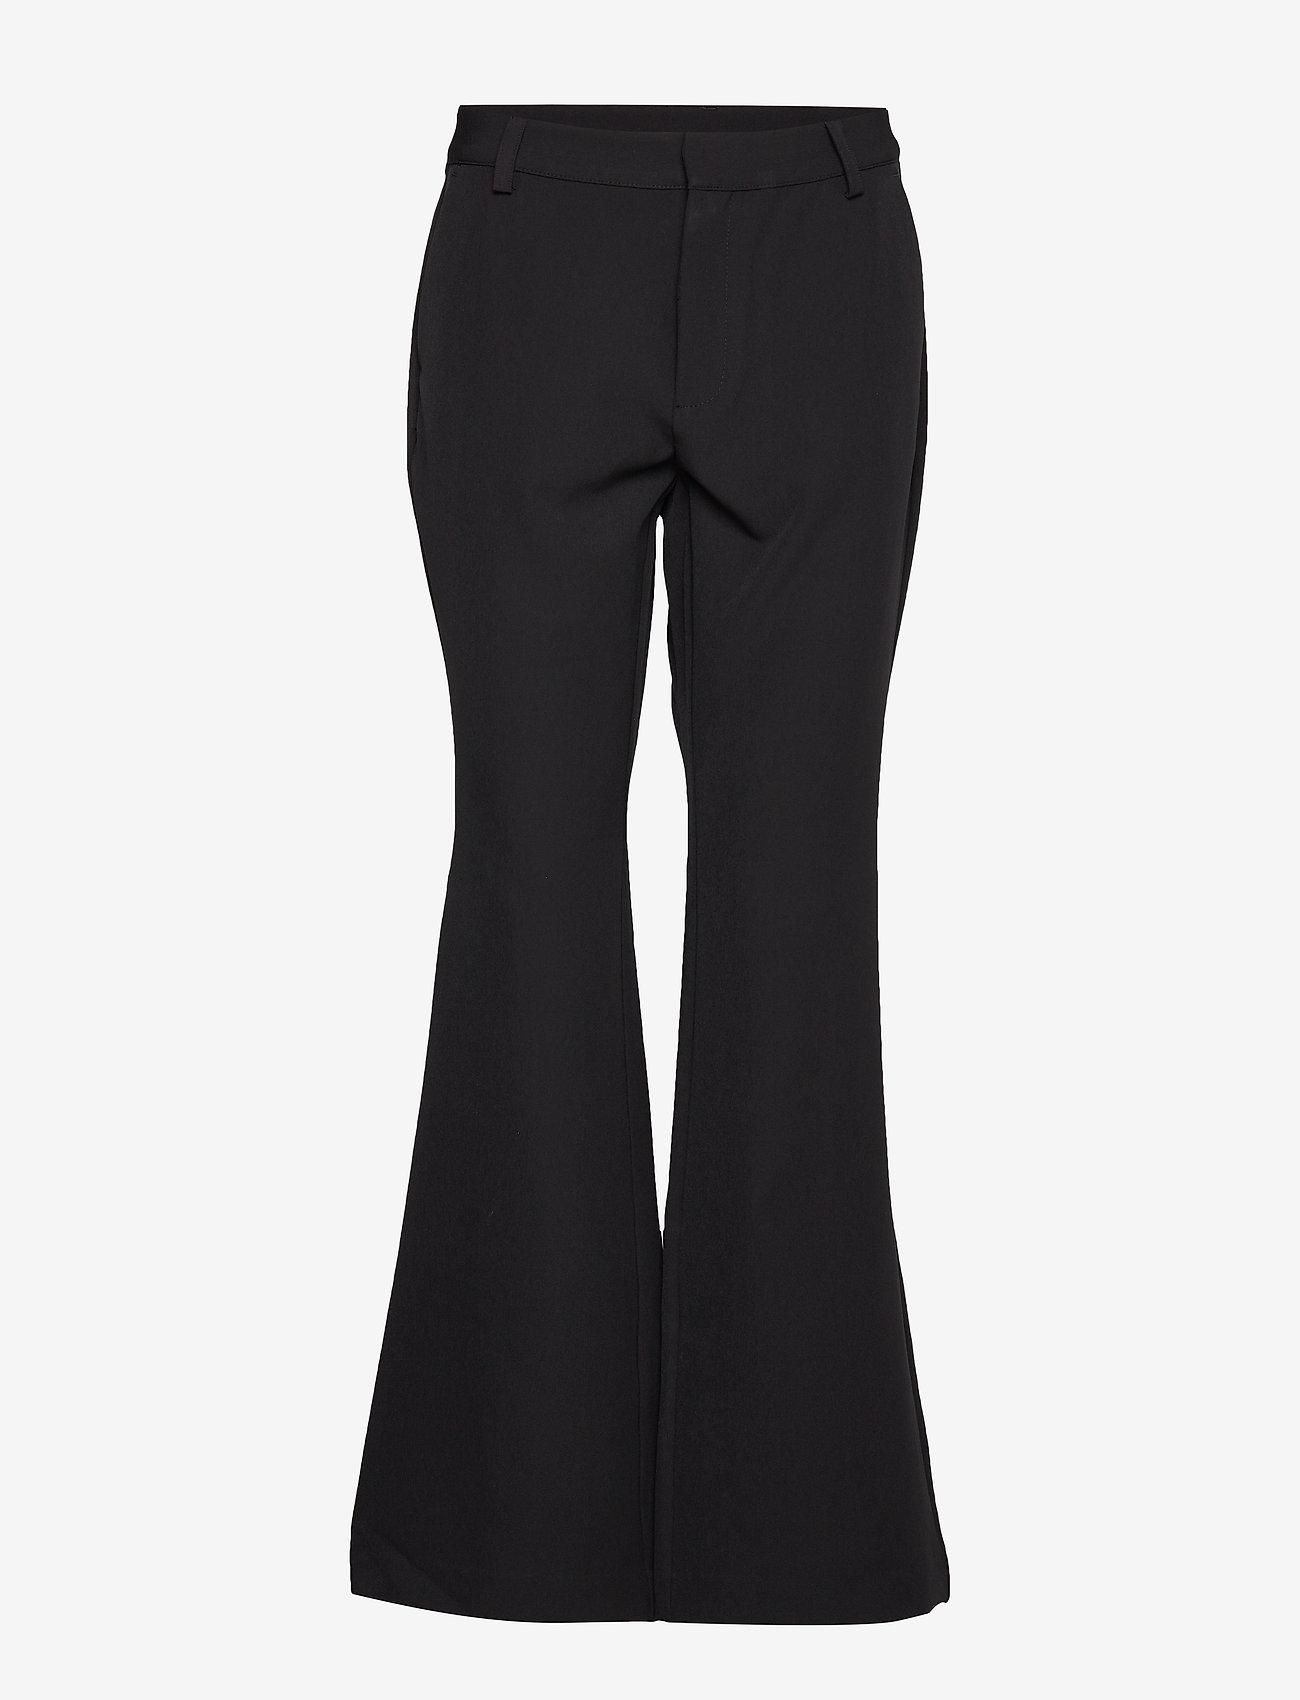 Denim Hunter - 14 THE BLACK FLARED PANT - bukser med brede ben - black - 1